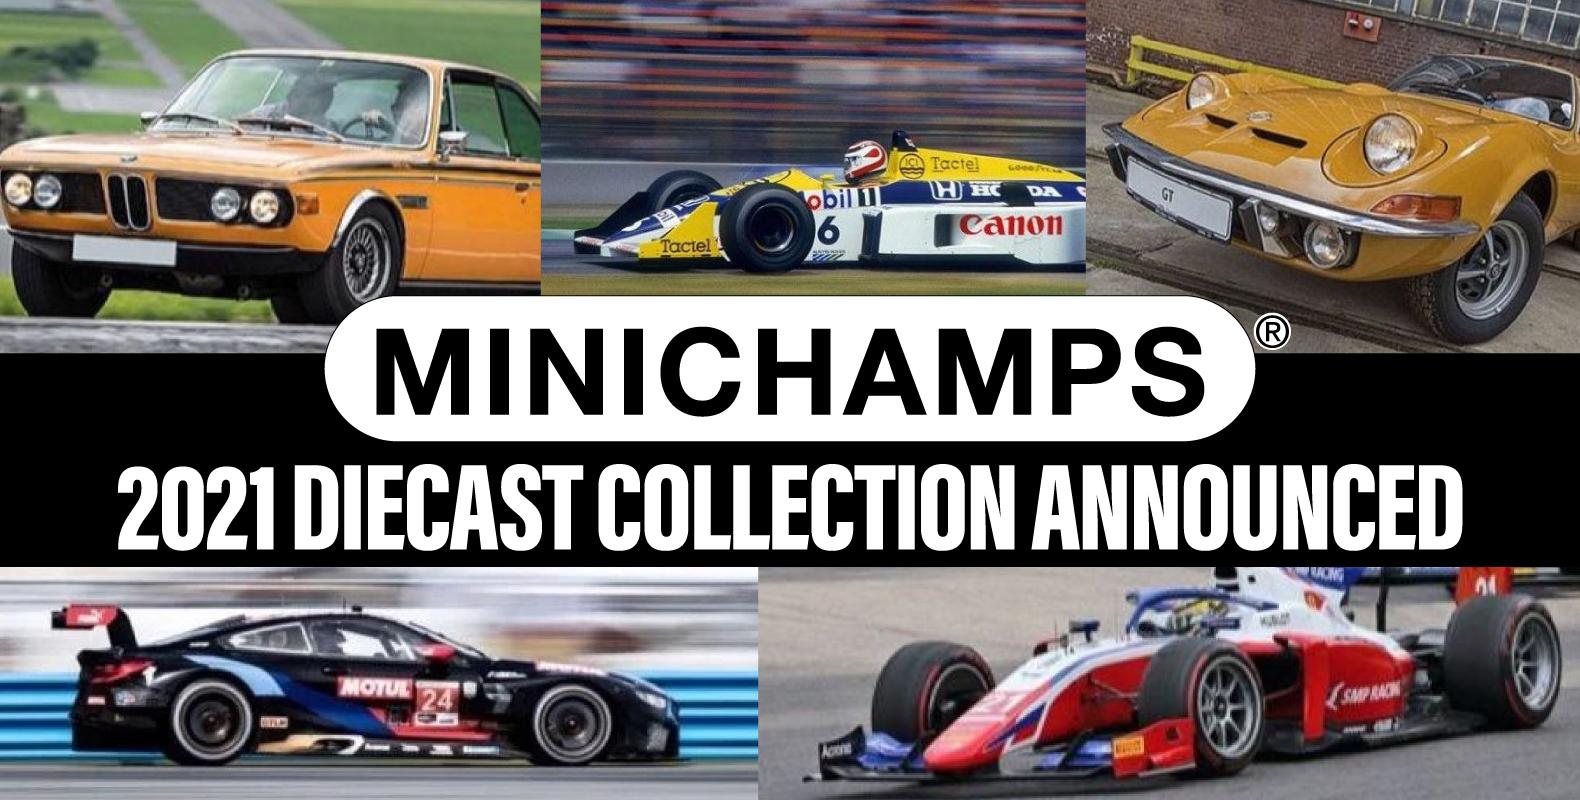 minichamps 2021 collection 03.19.21